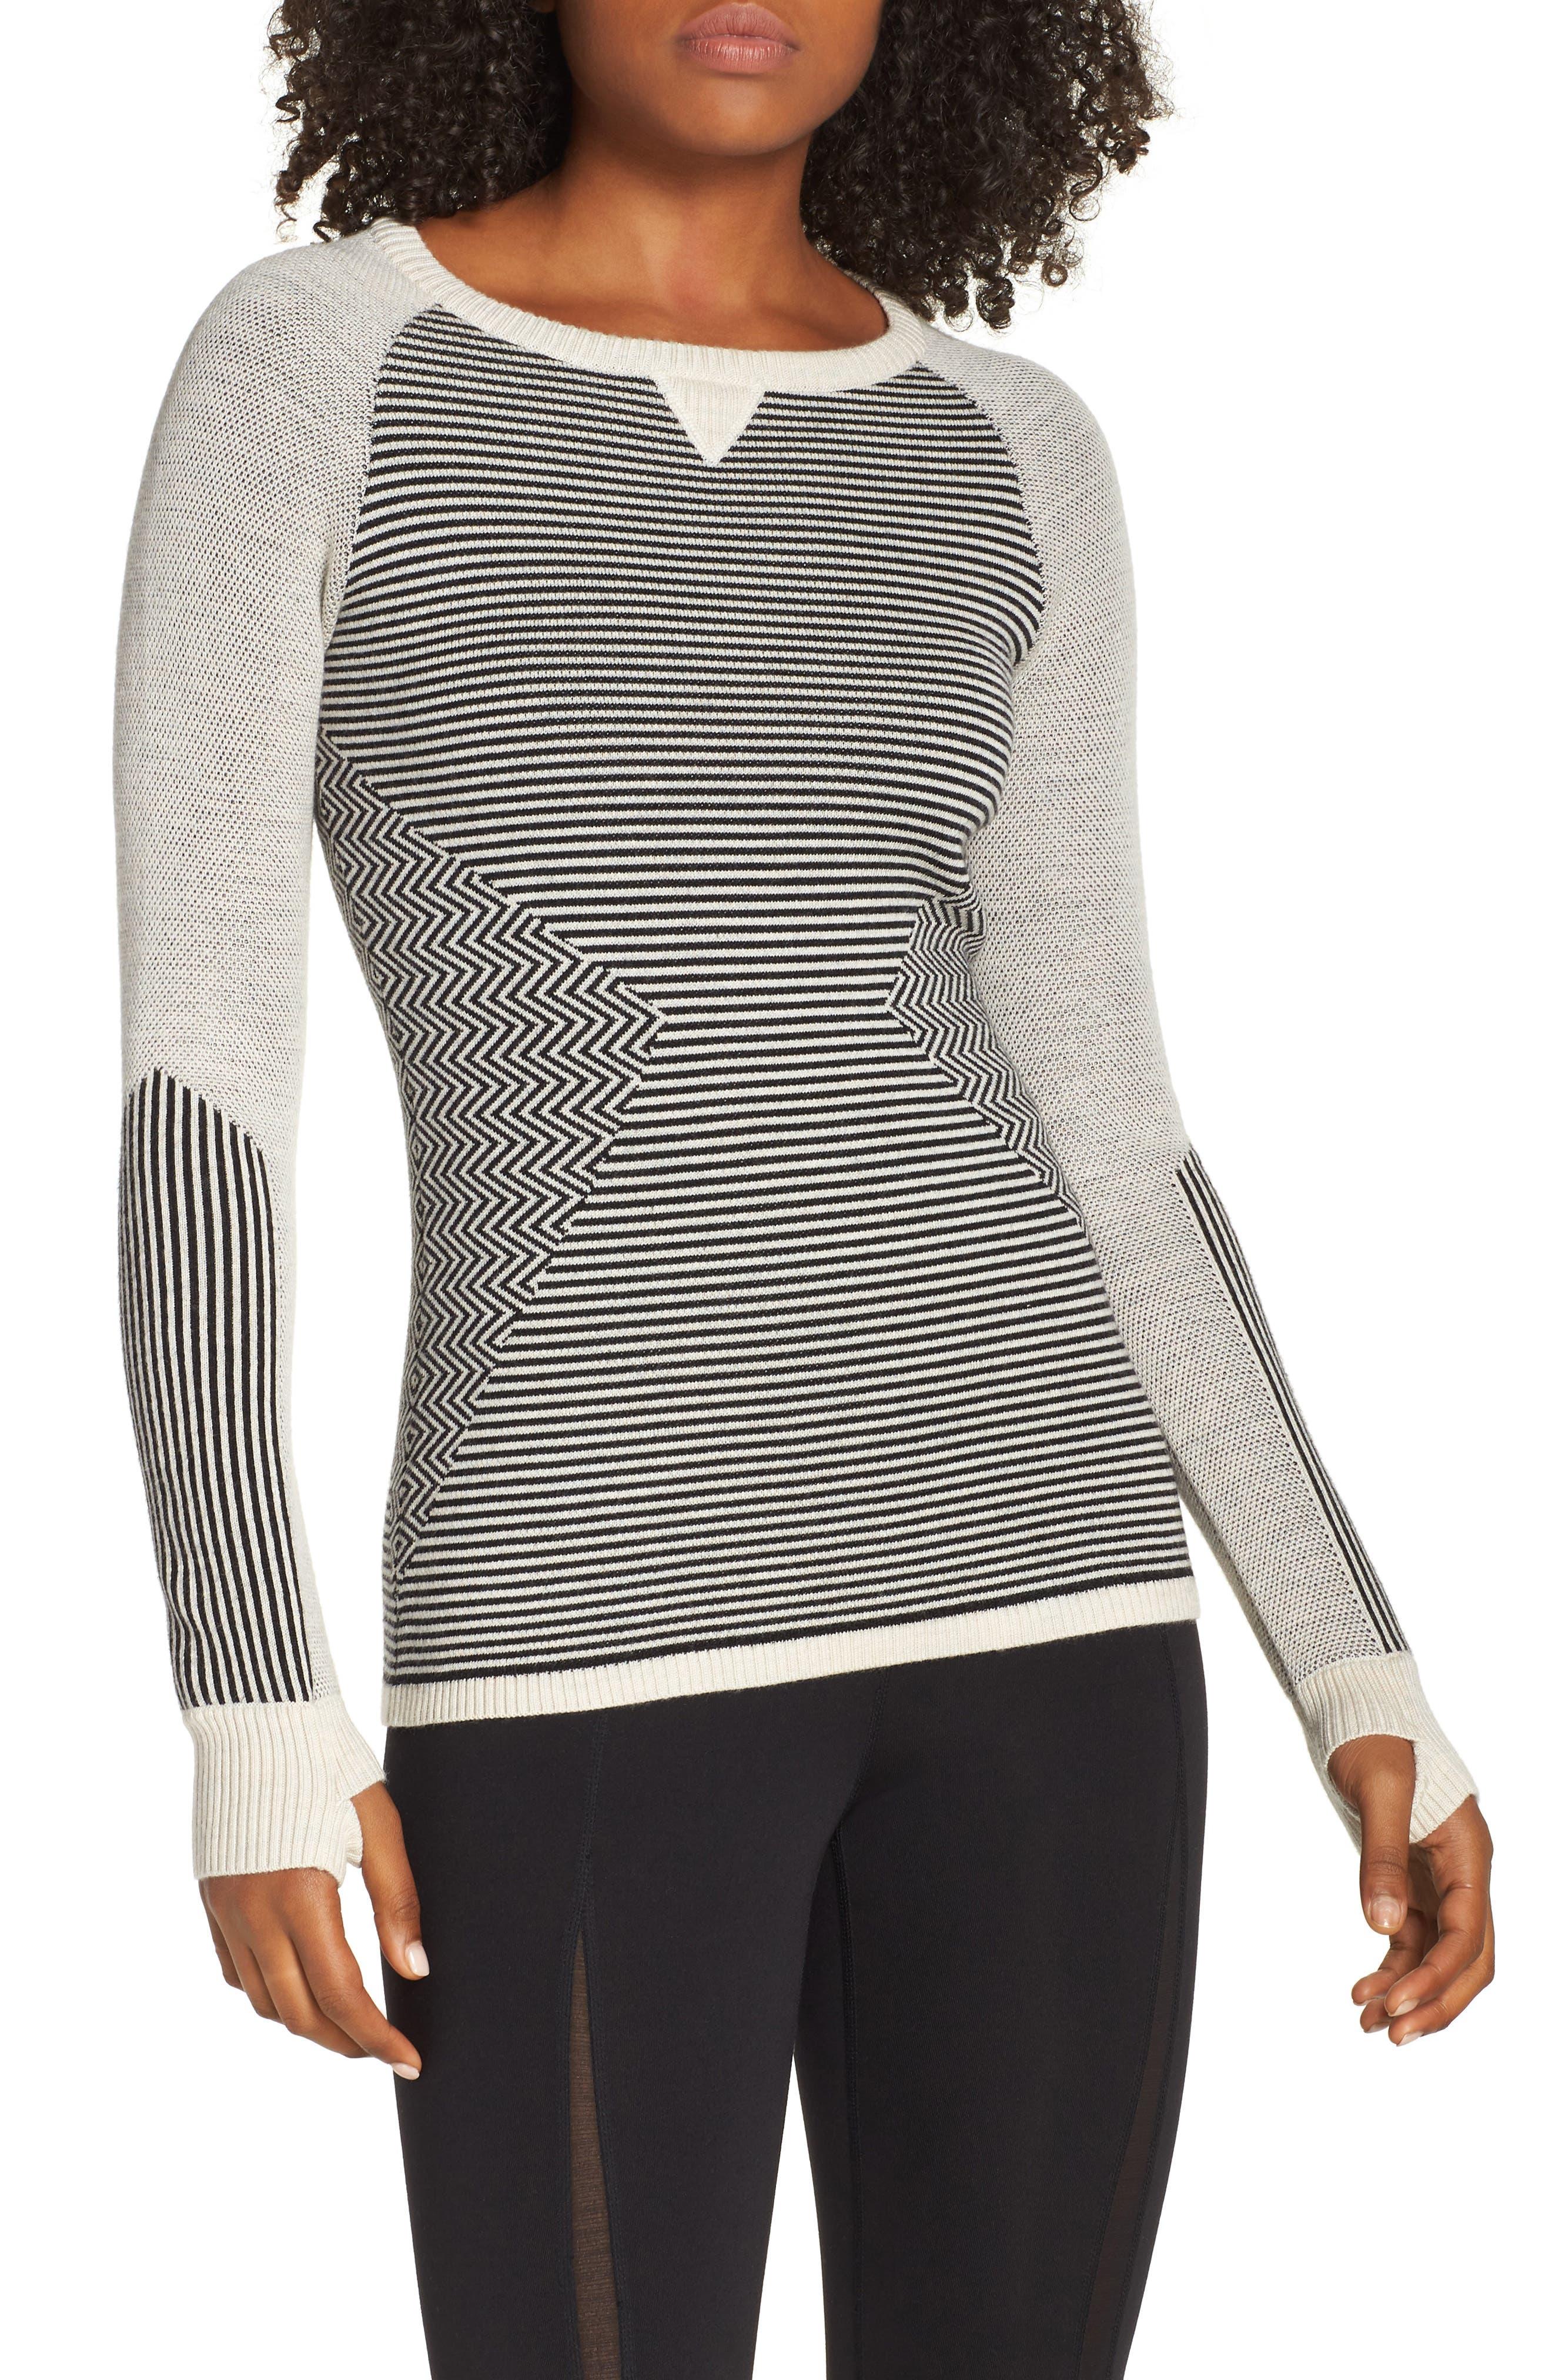 Dacono Ski Sweater,                             Main thumbnail 1, color,                             001